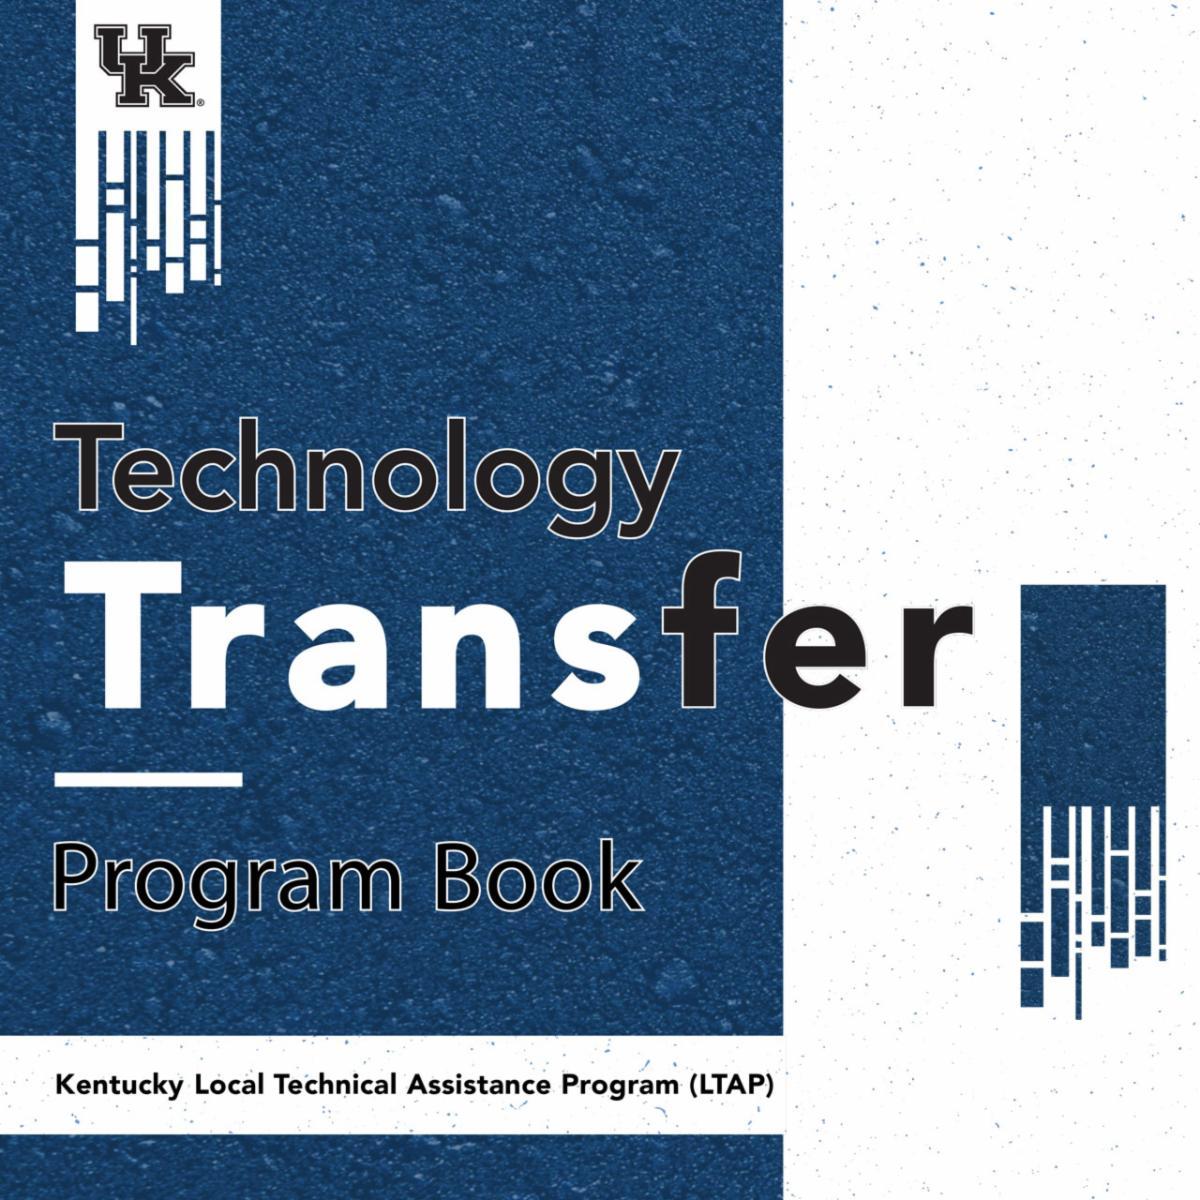 Program-Book-2021-1.jpg